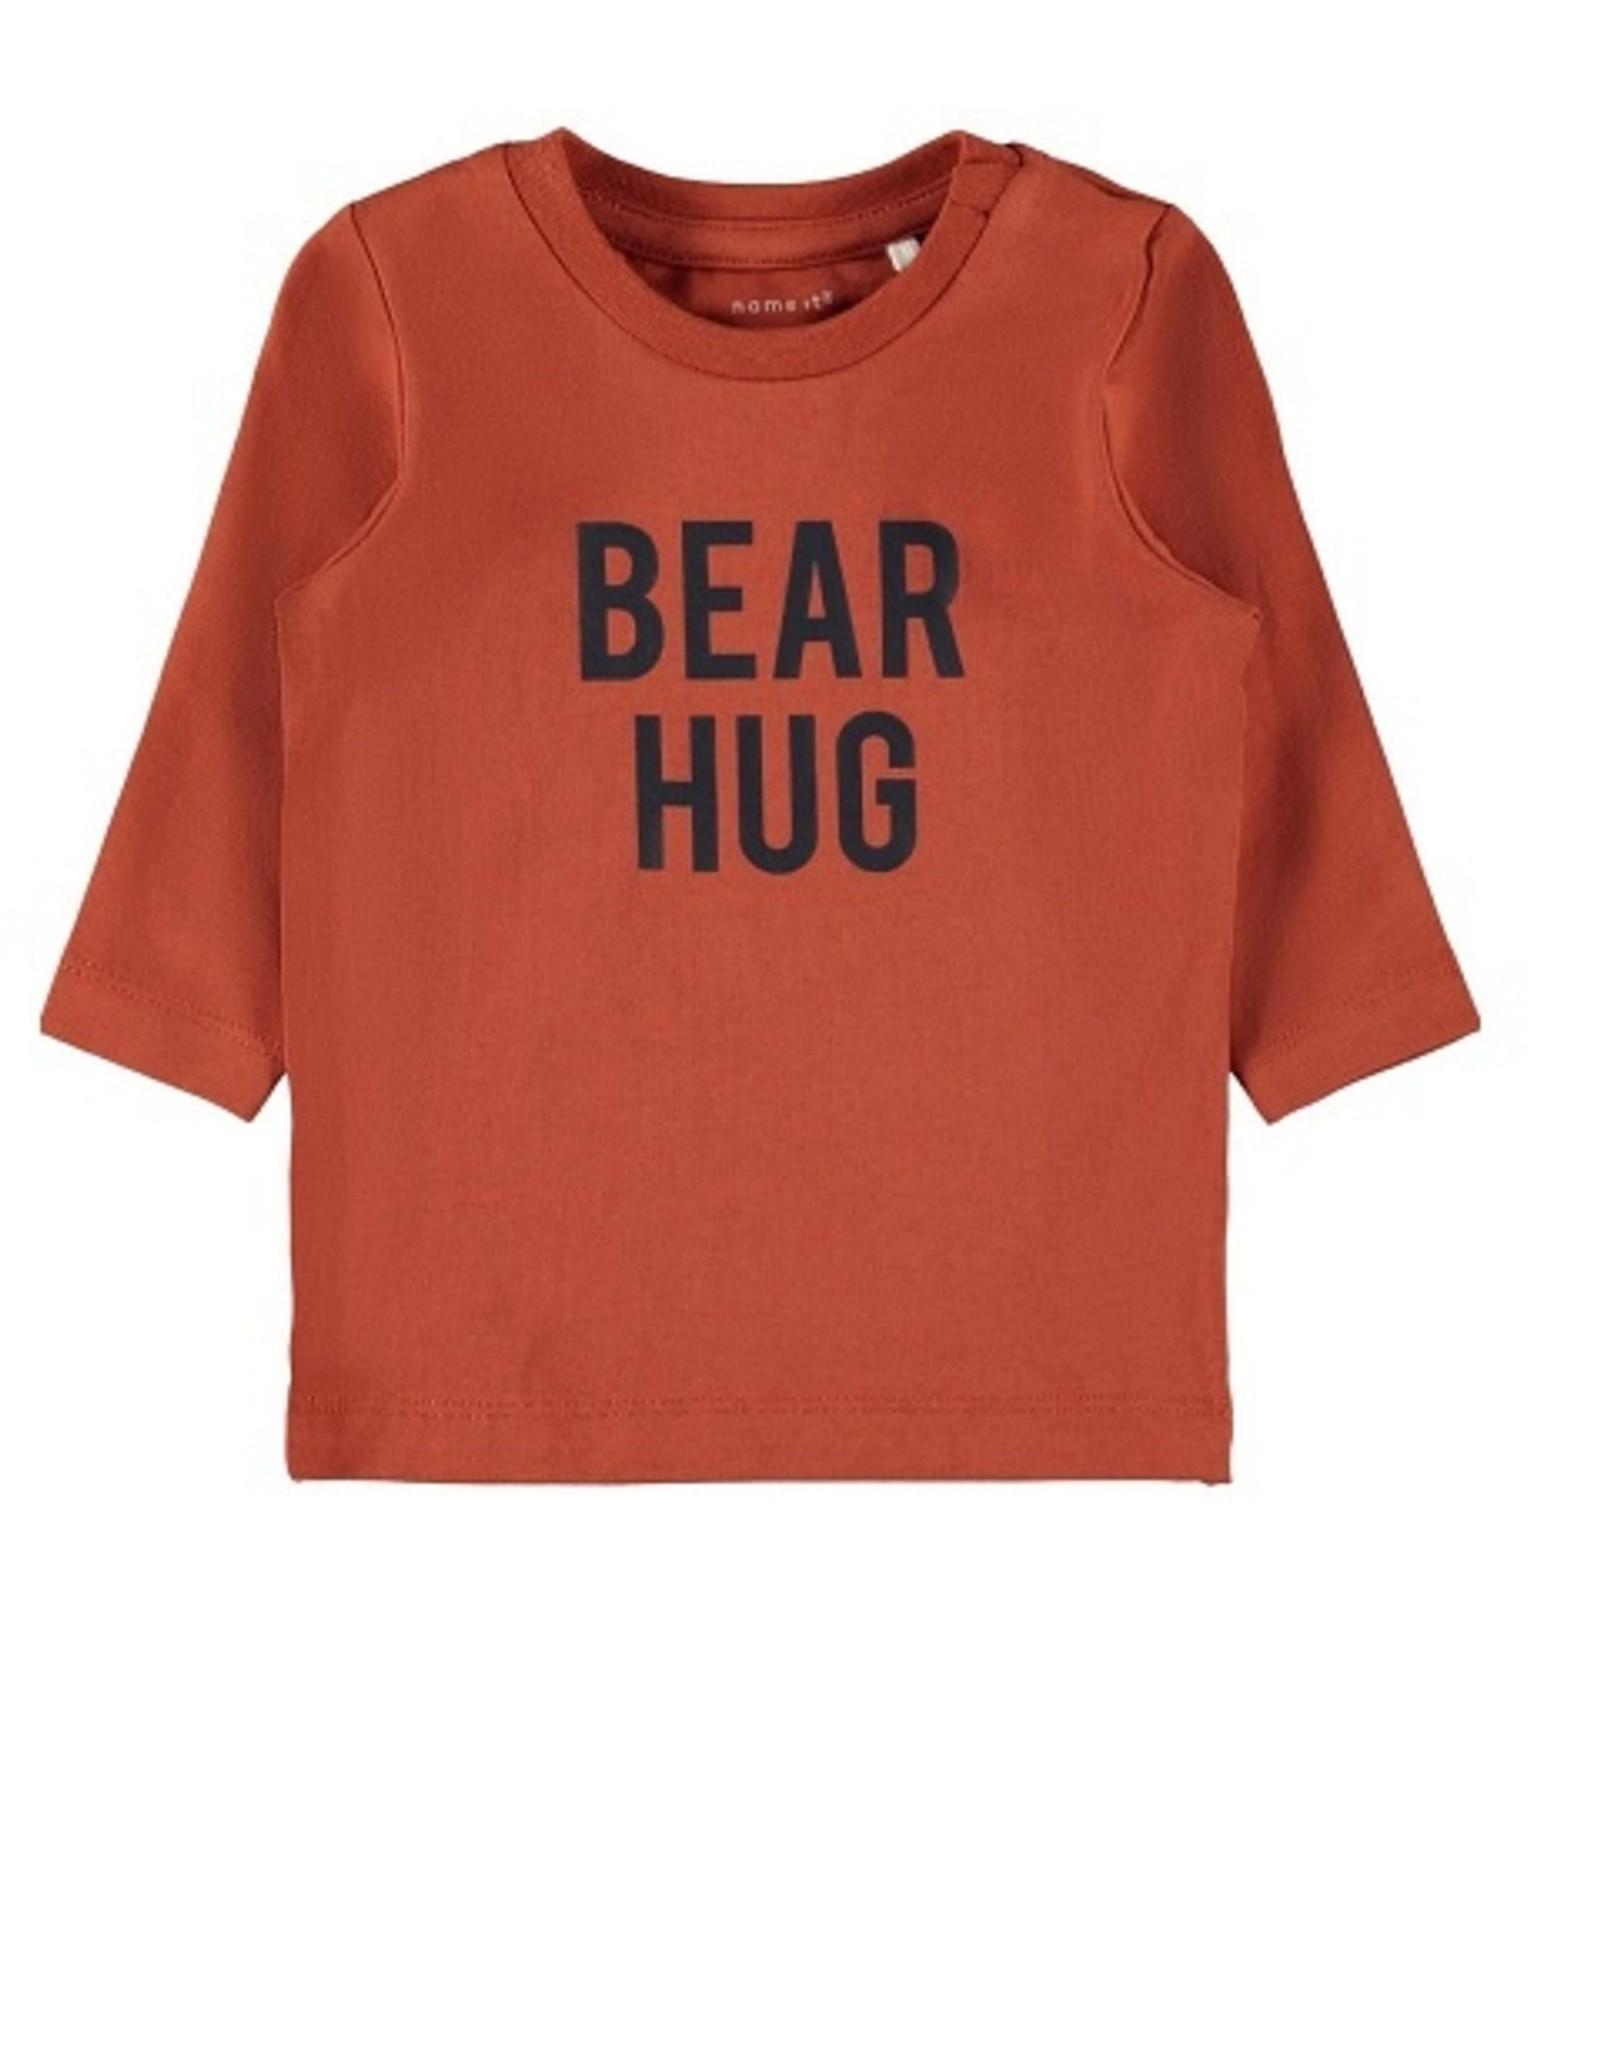 Name It T-shirt oranje/roest  BEAR HUG